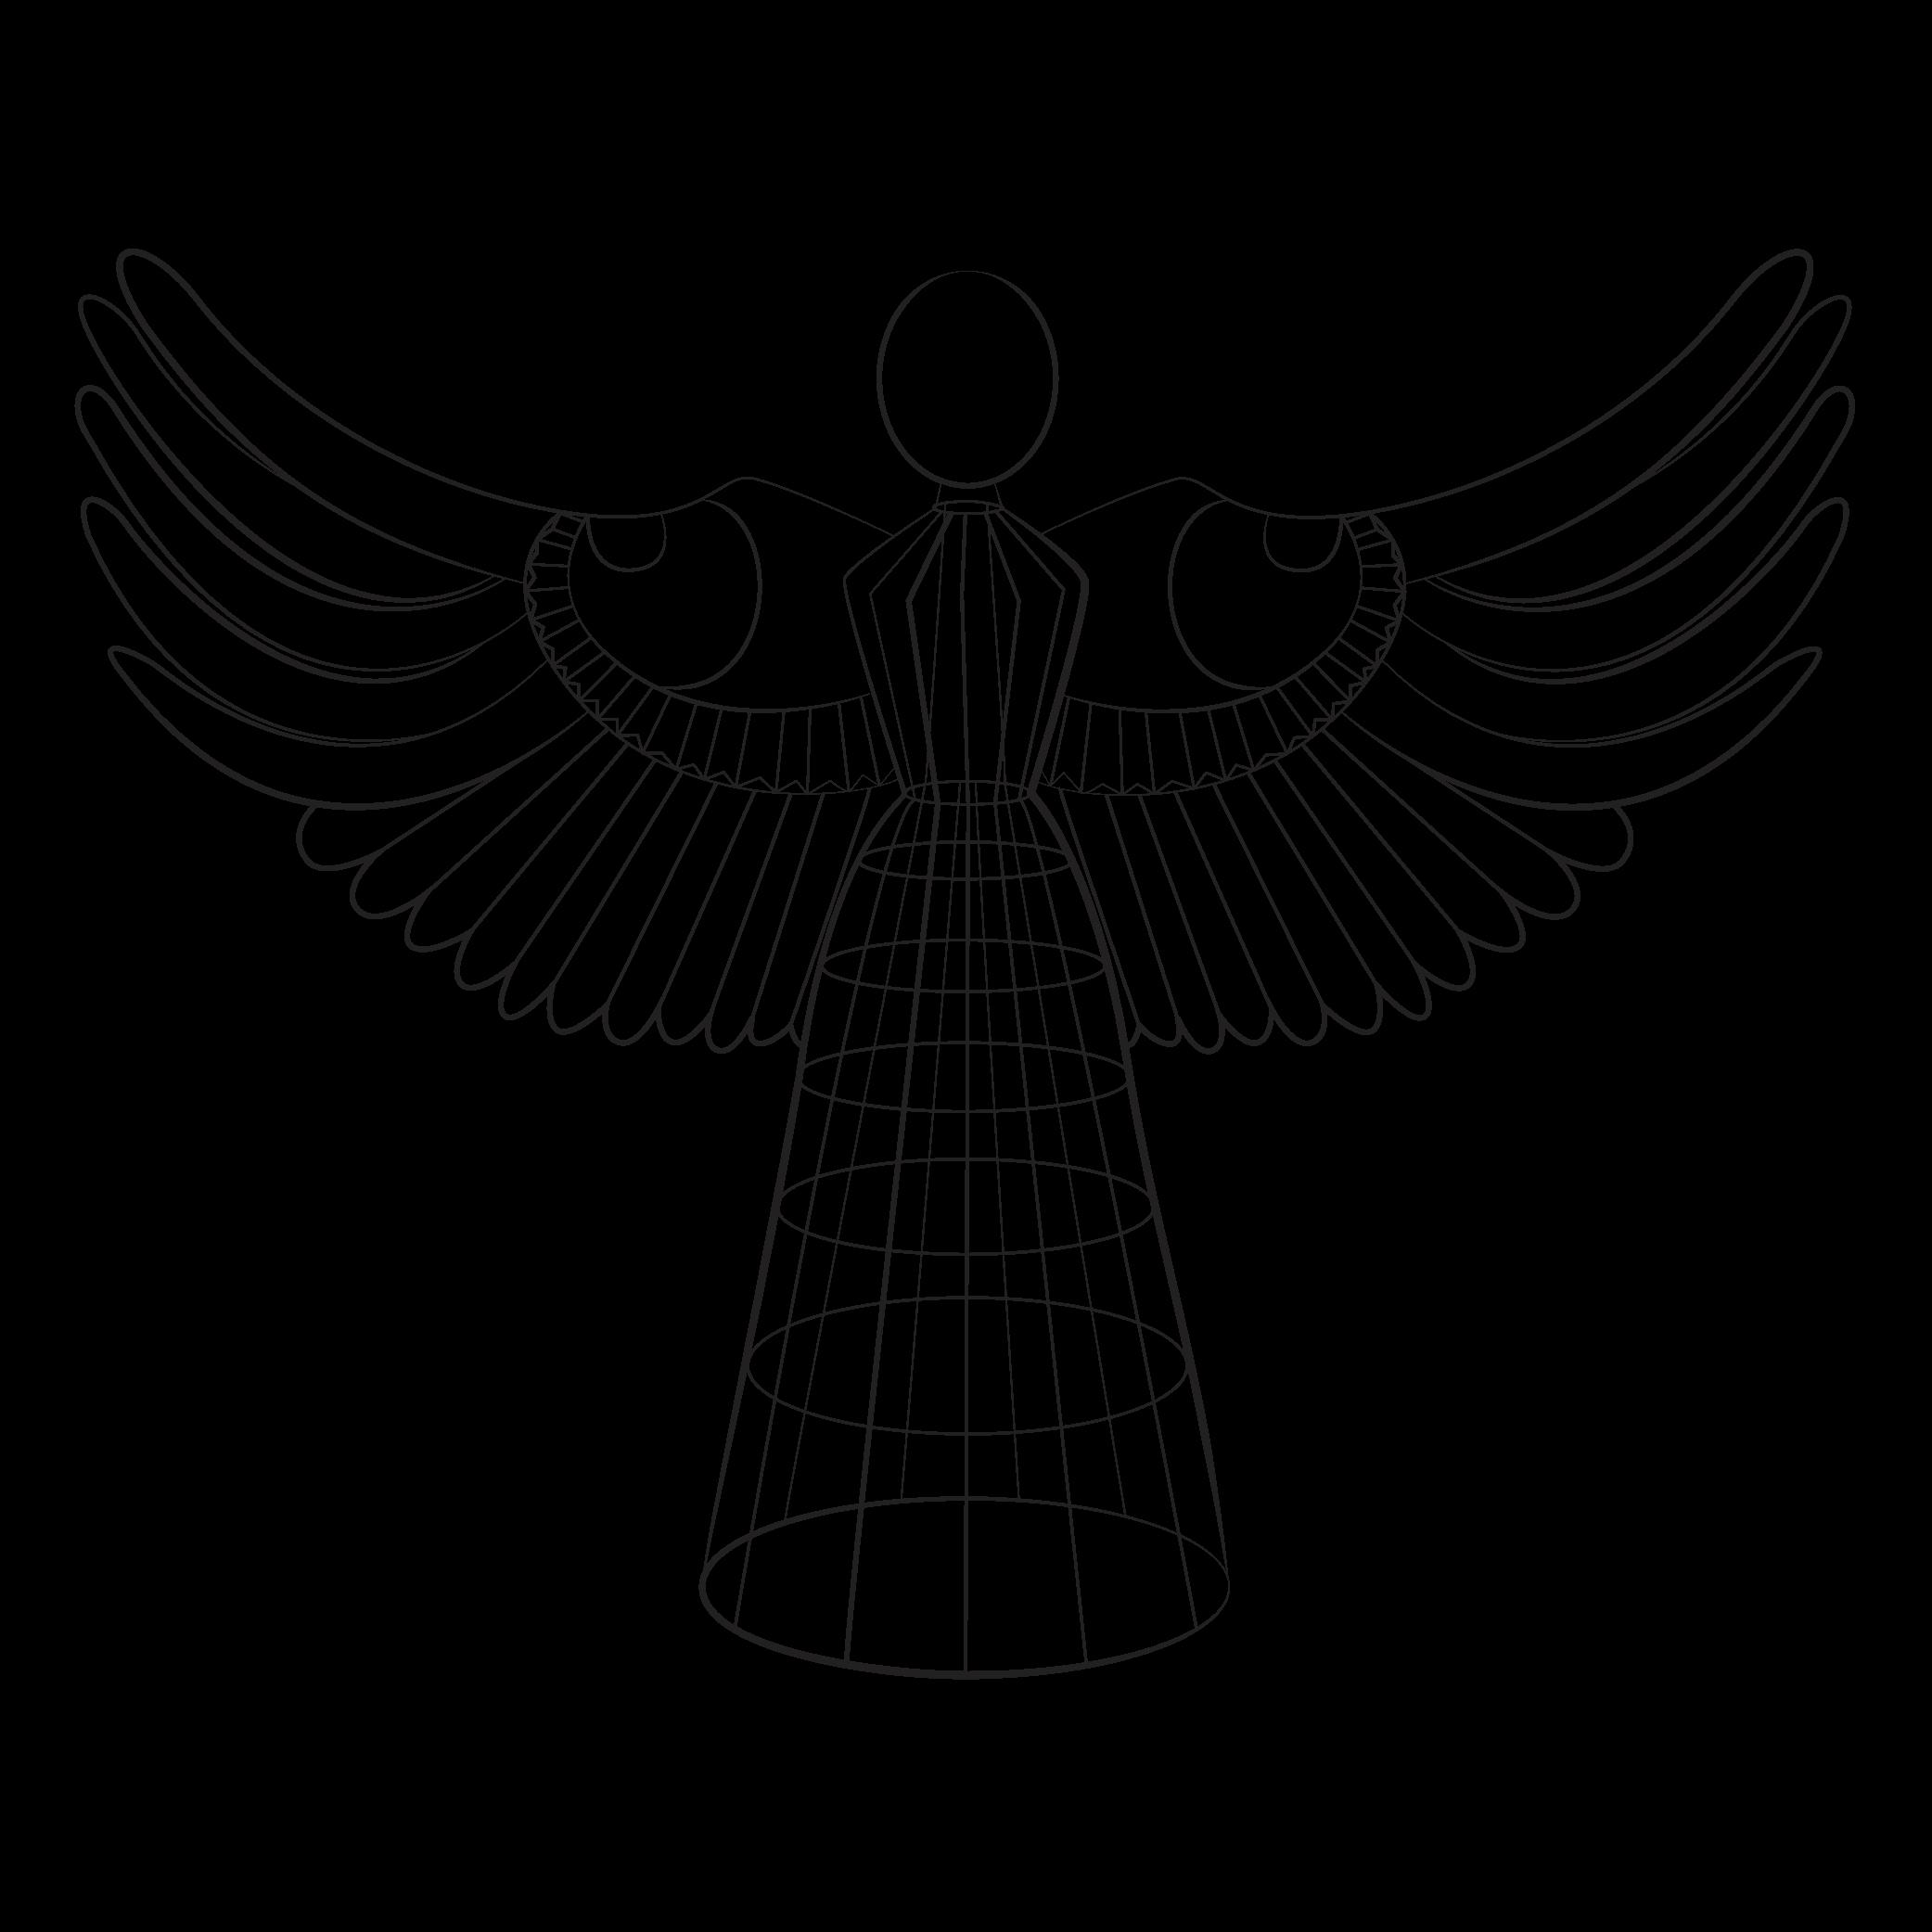 angel-01-01.png